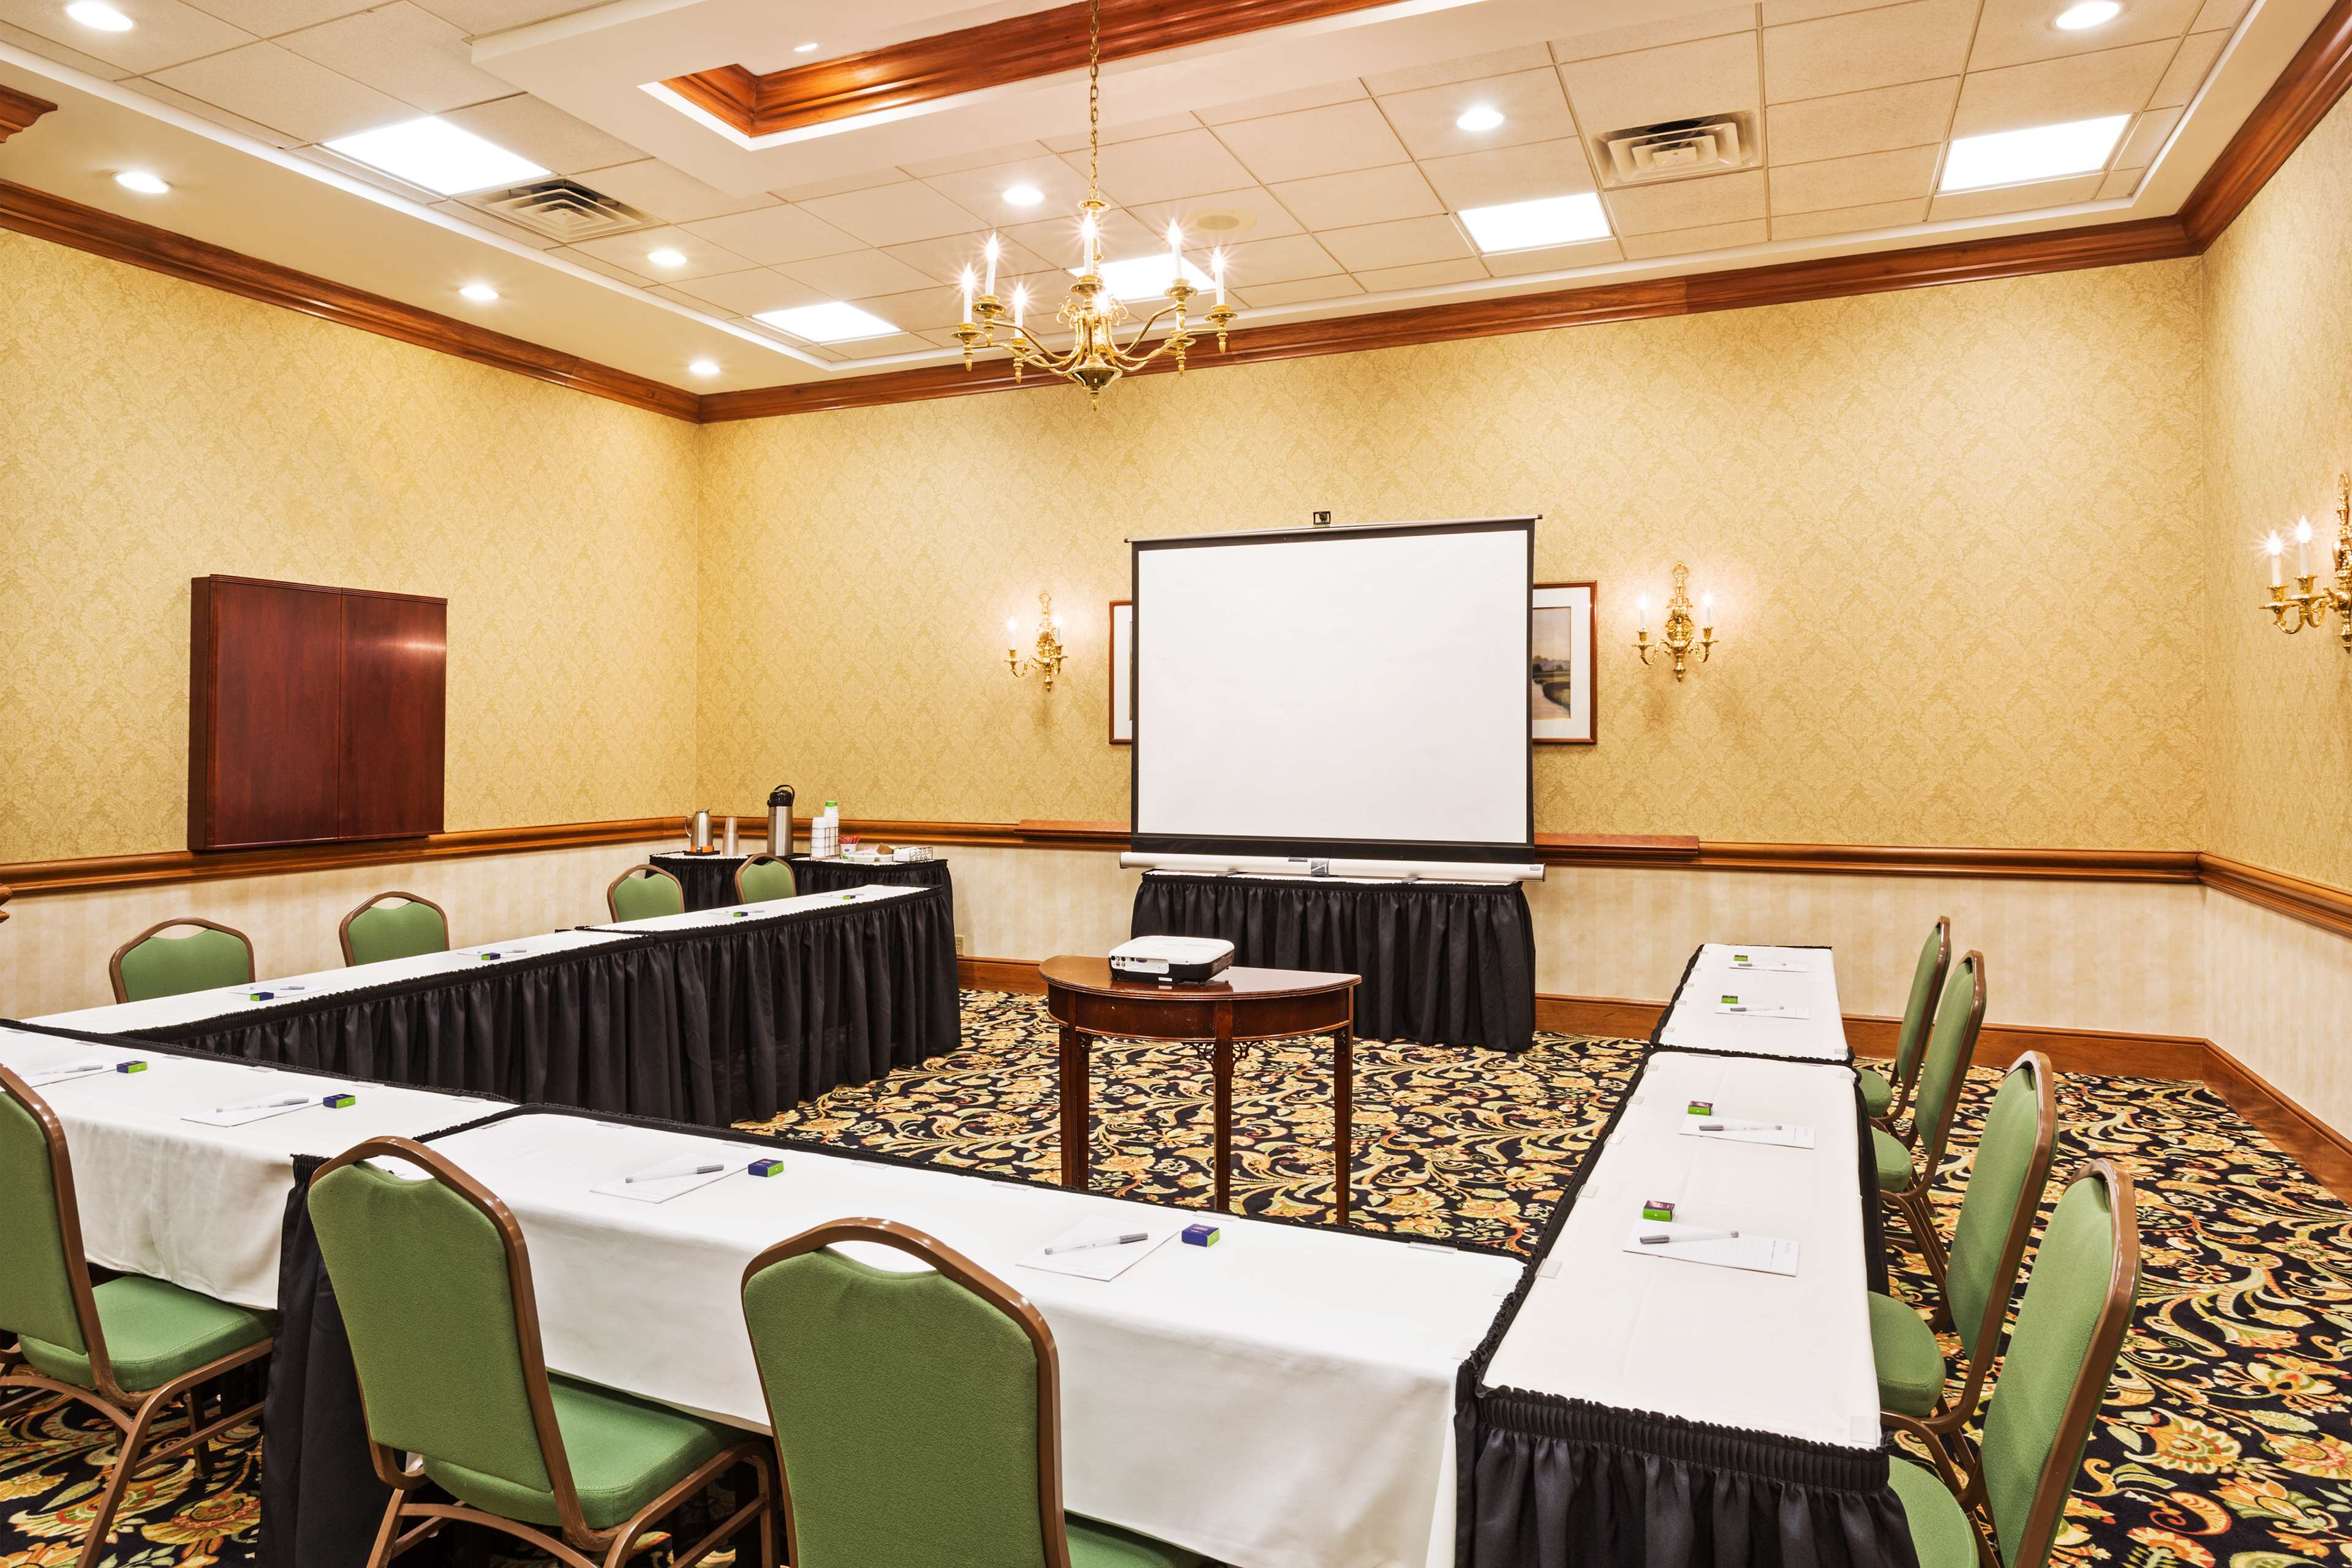 Hampton Inn & Suites Greenville/Spartanburg I-85 image 14